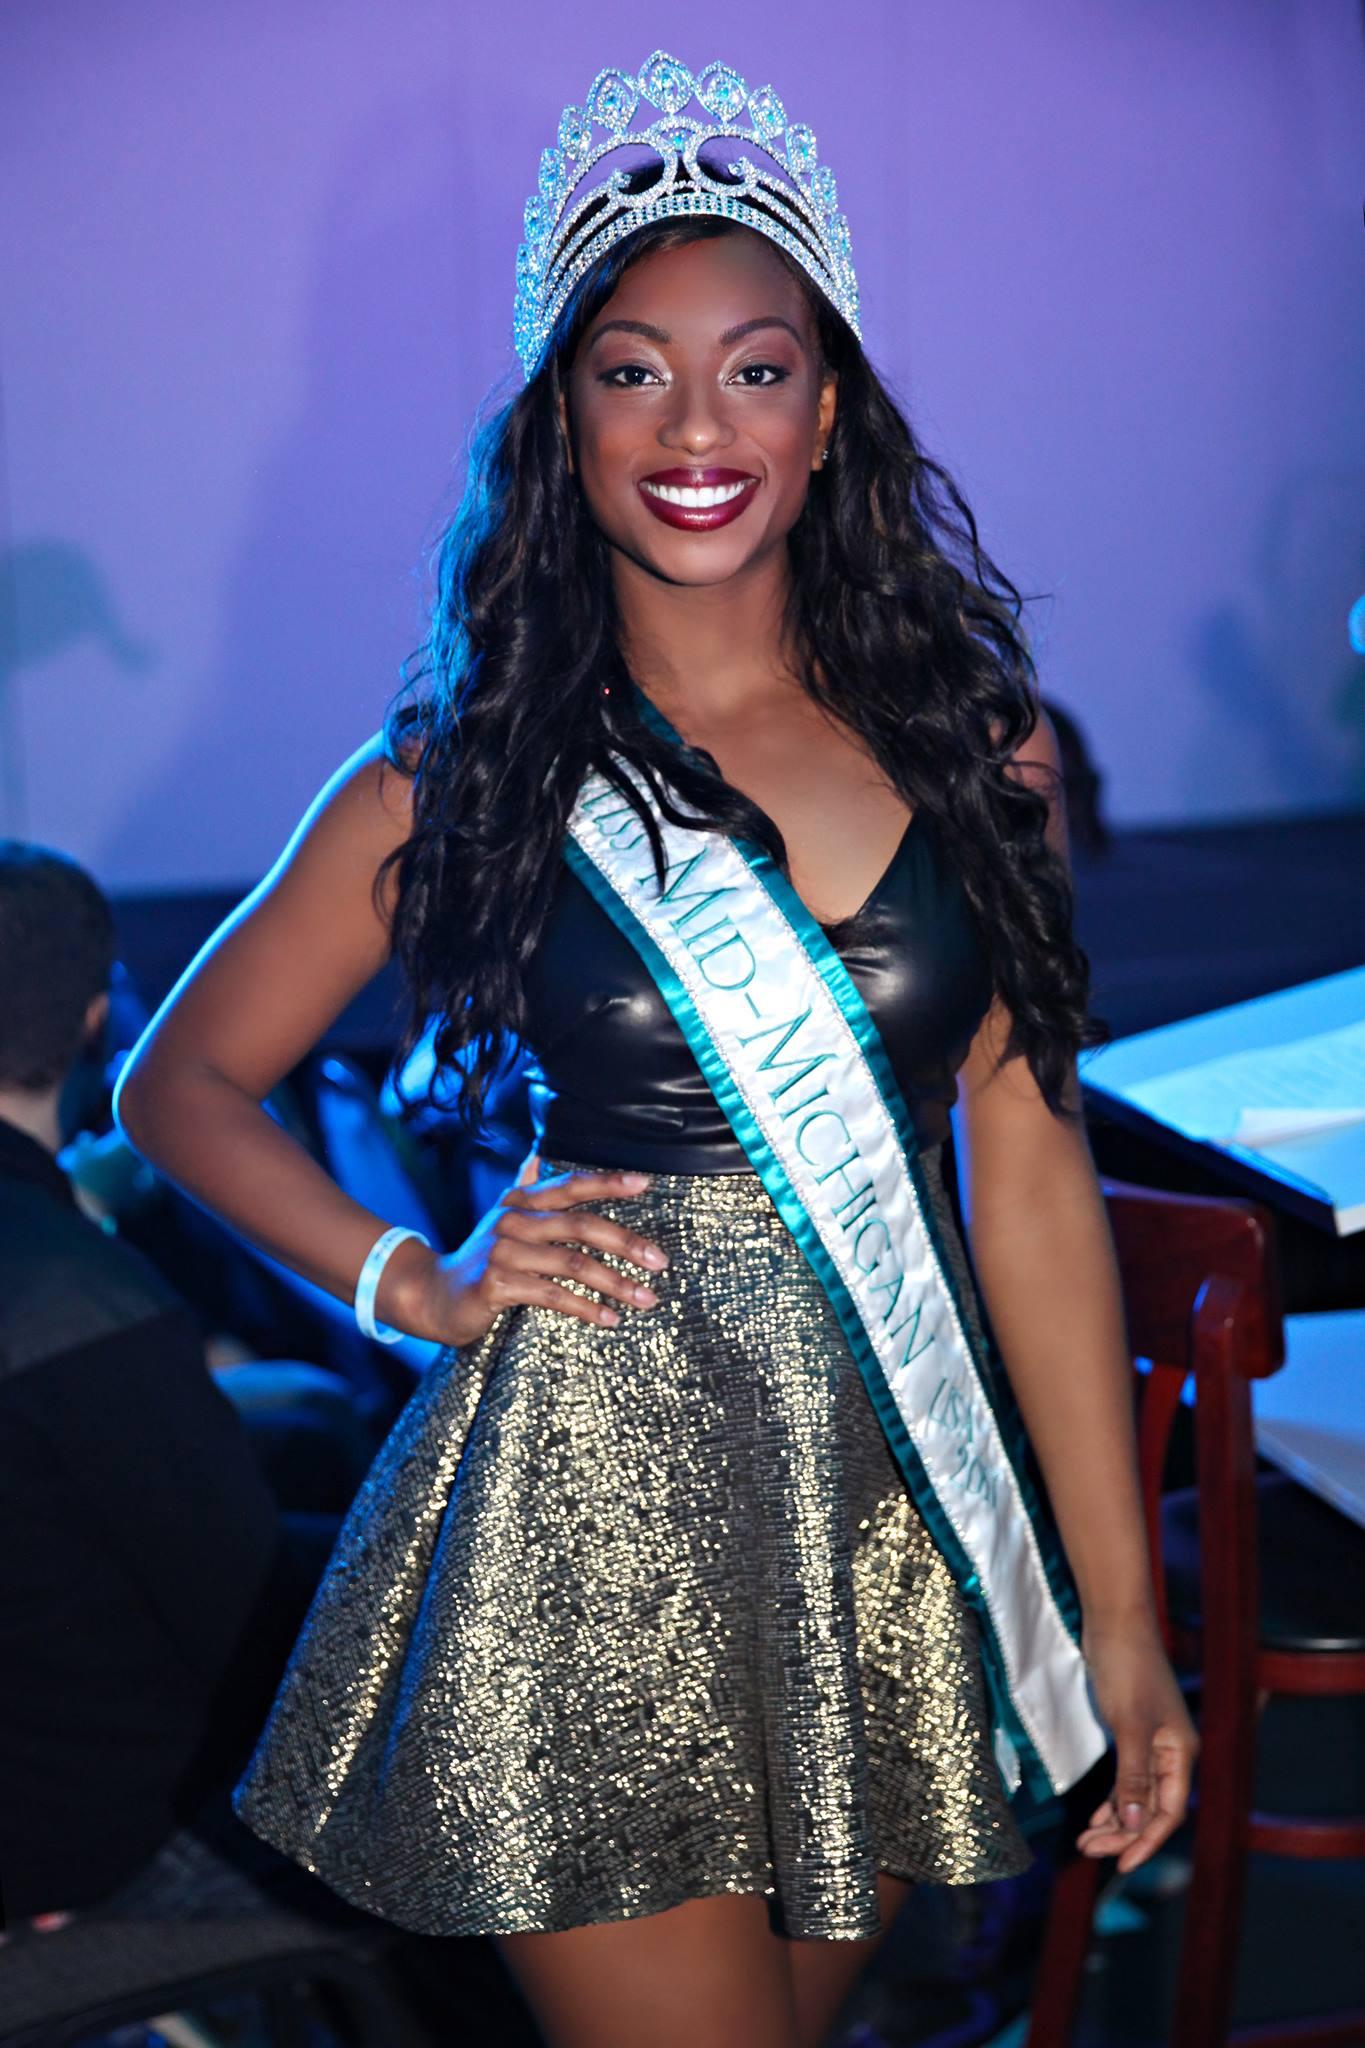 Hosting Toledo Fashion Week as Miss Mid-Michigan USA 2017